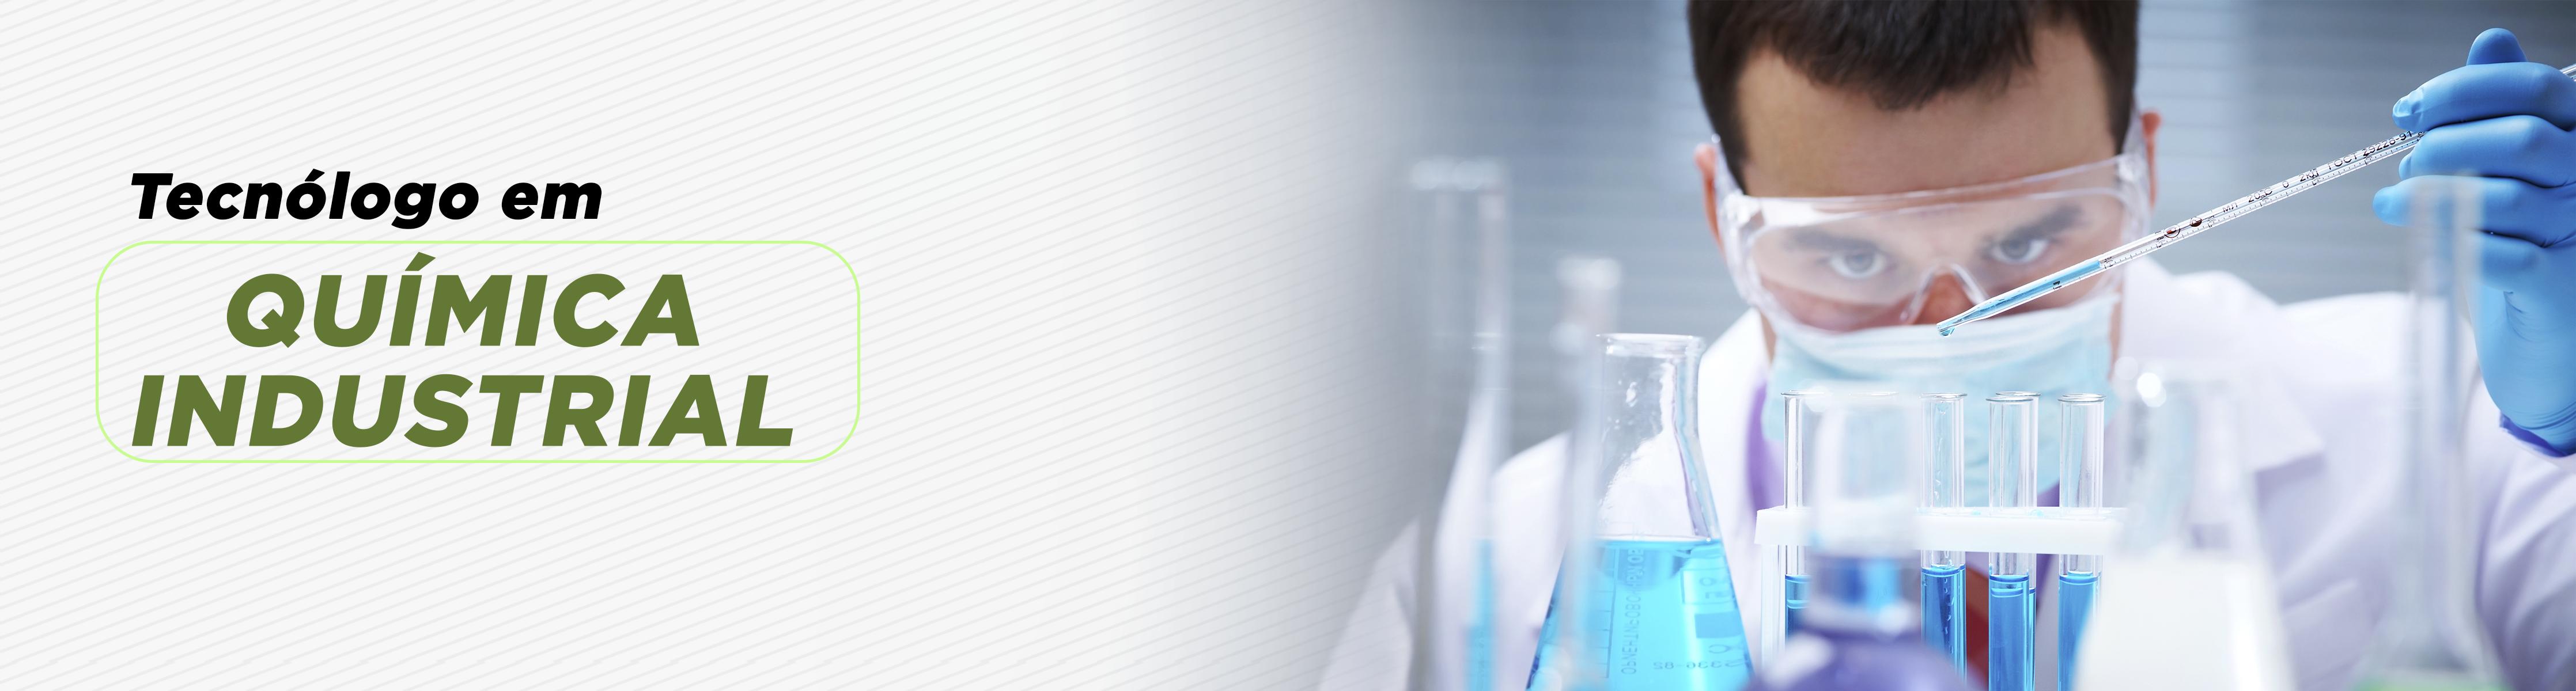 quimica-industrial-presencial-unifacear